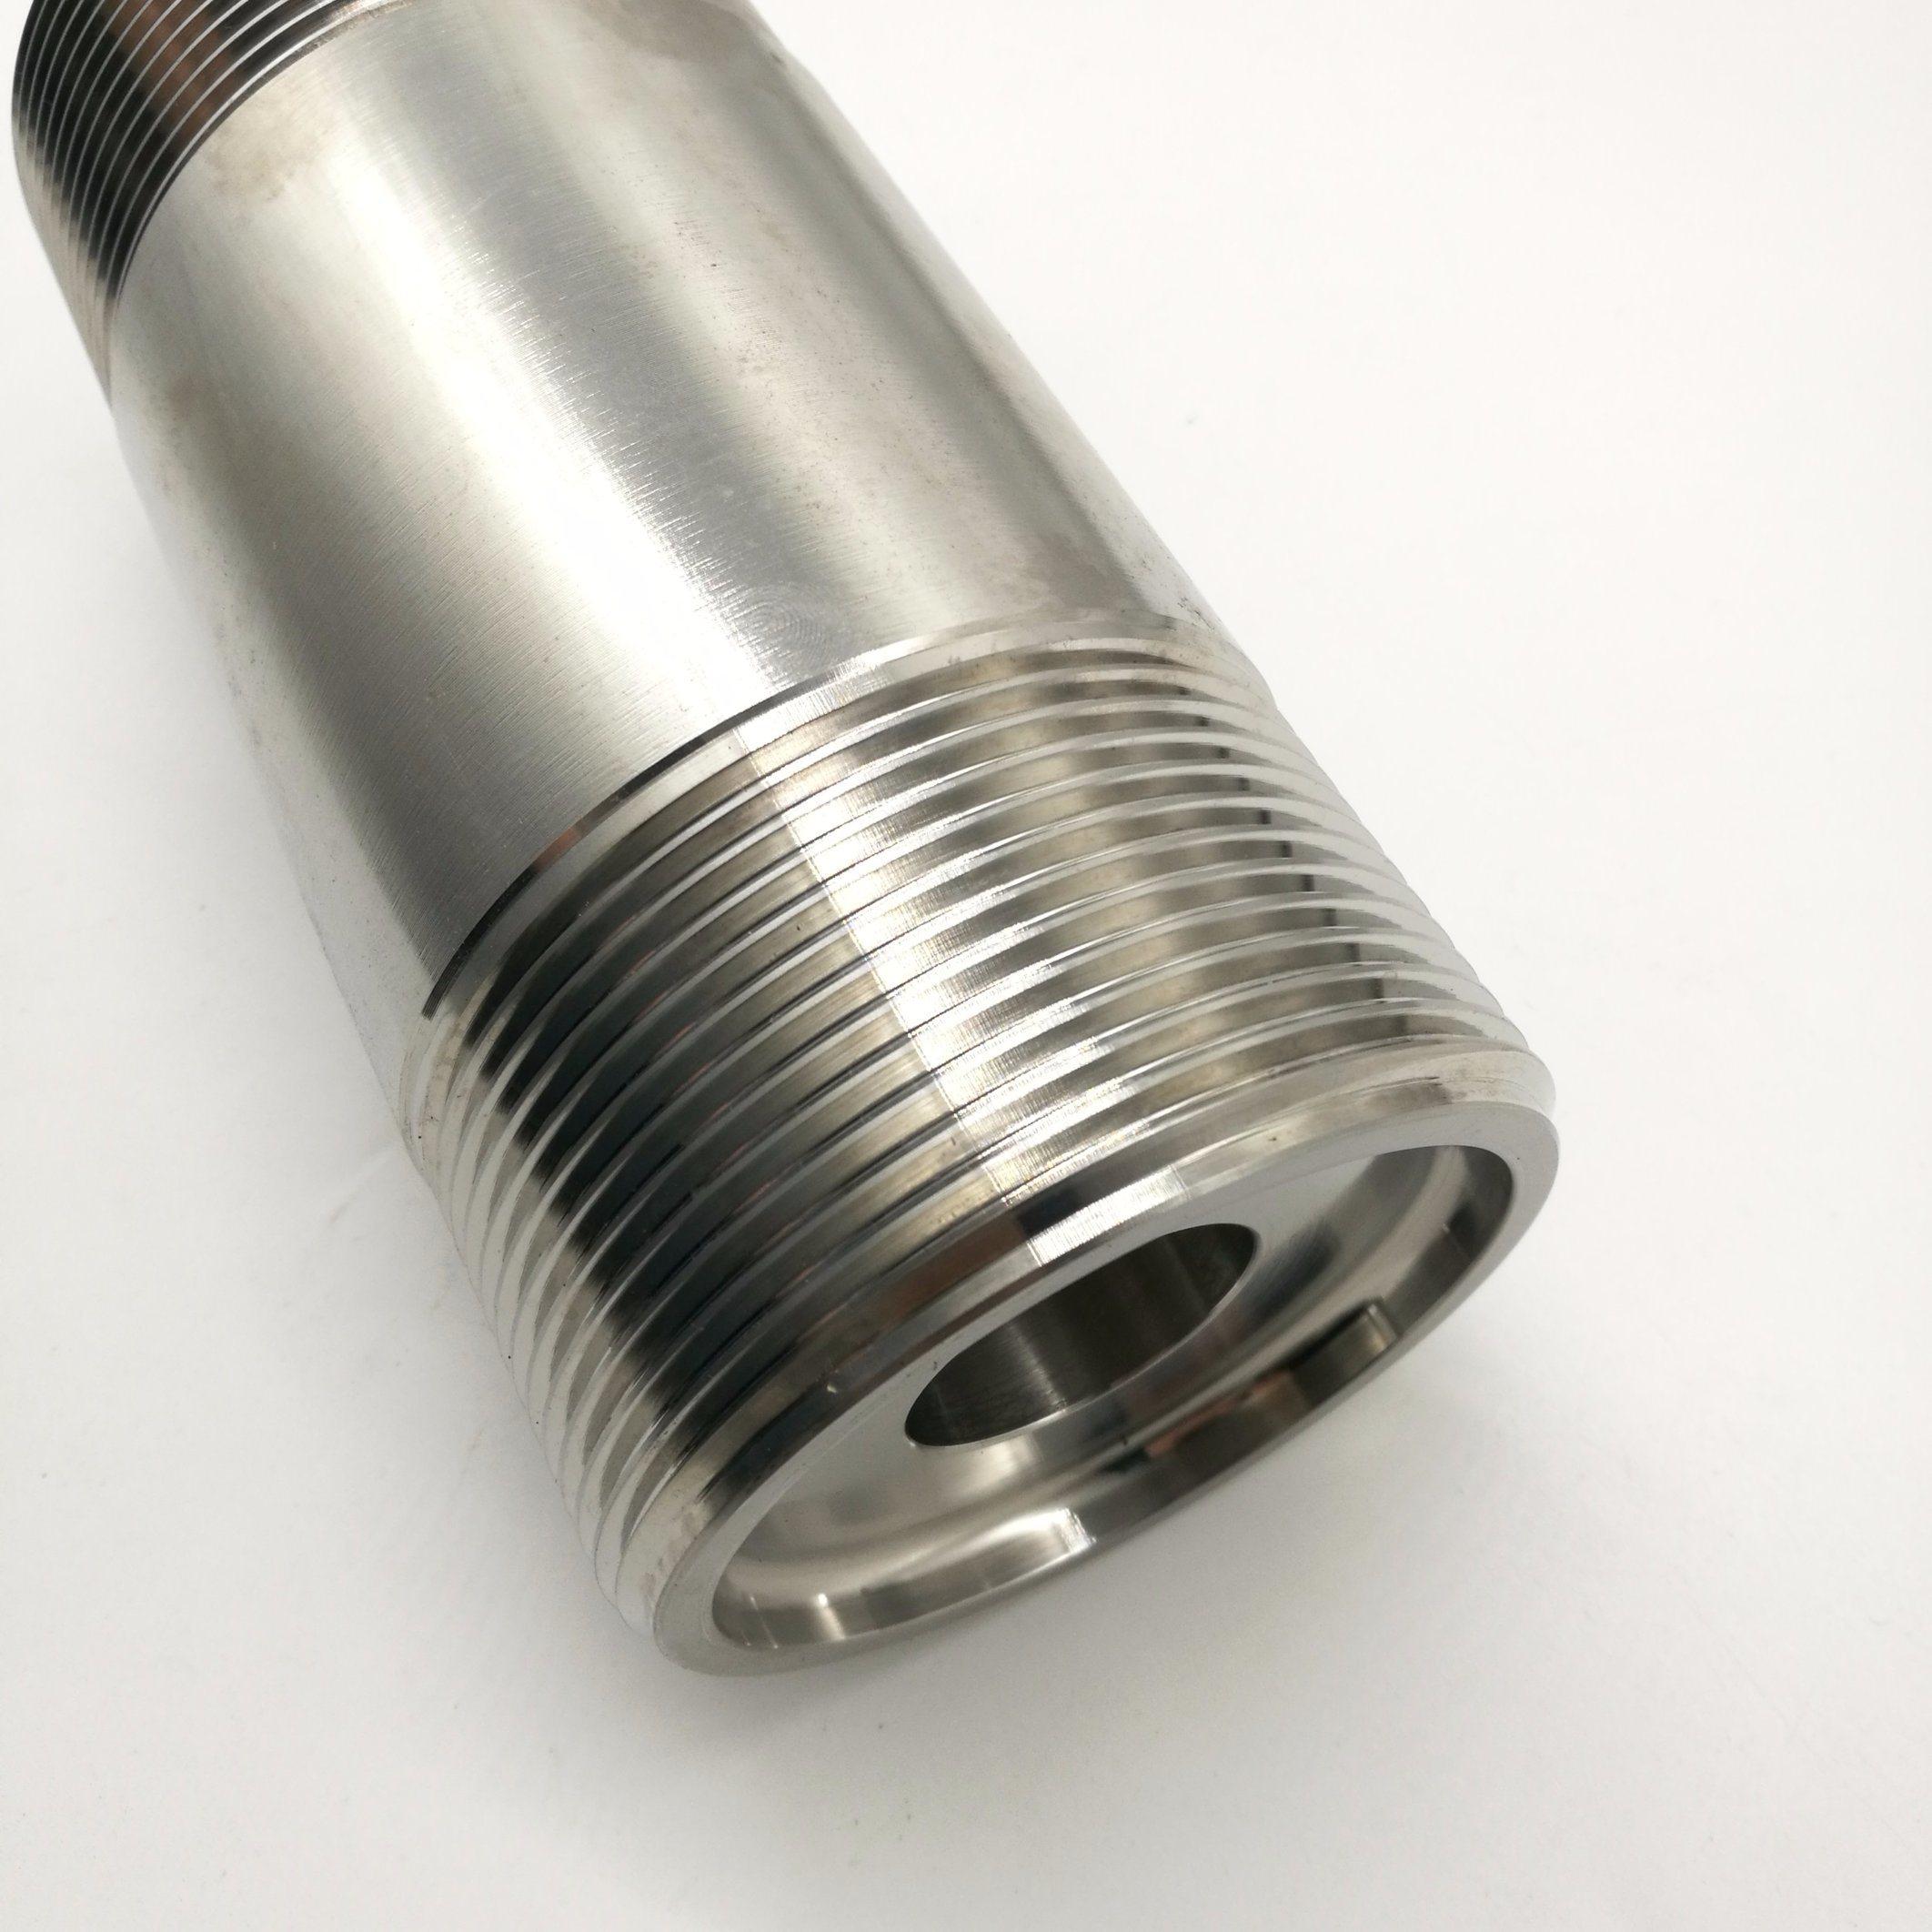 420 MPa Water Jet Cutting Machine High Pressure Cylinder Waterjet Intensifier Parts